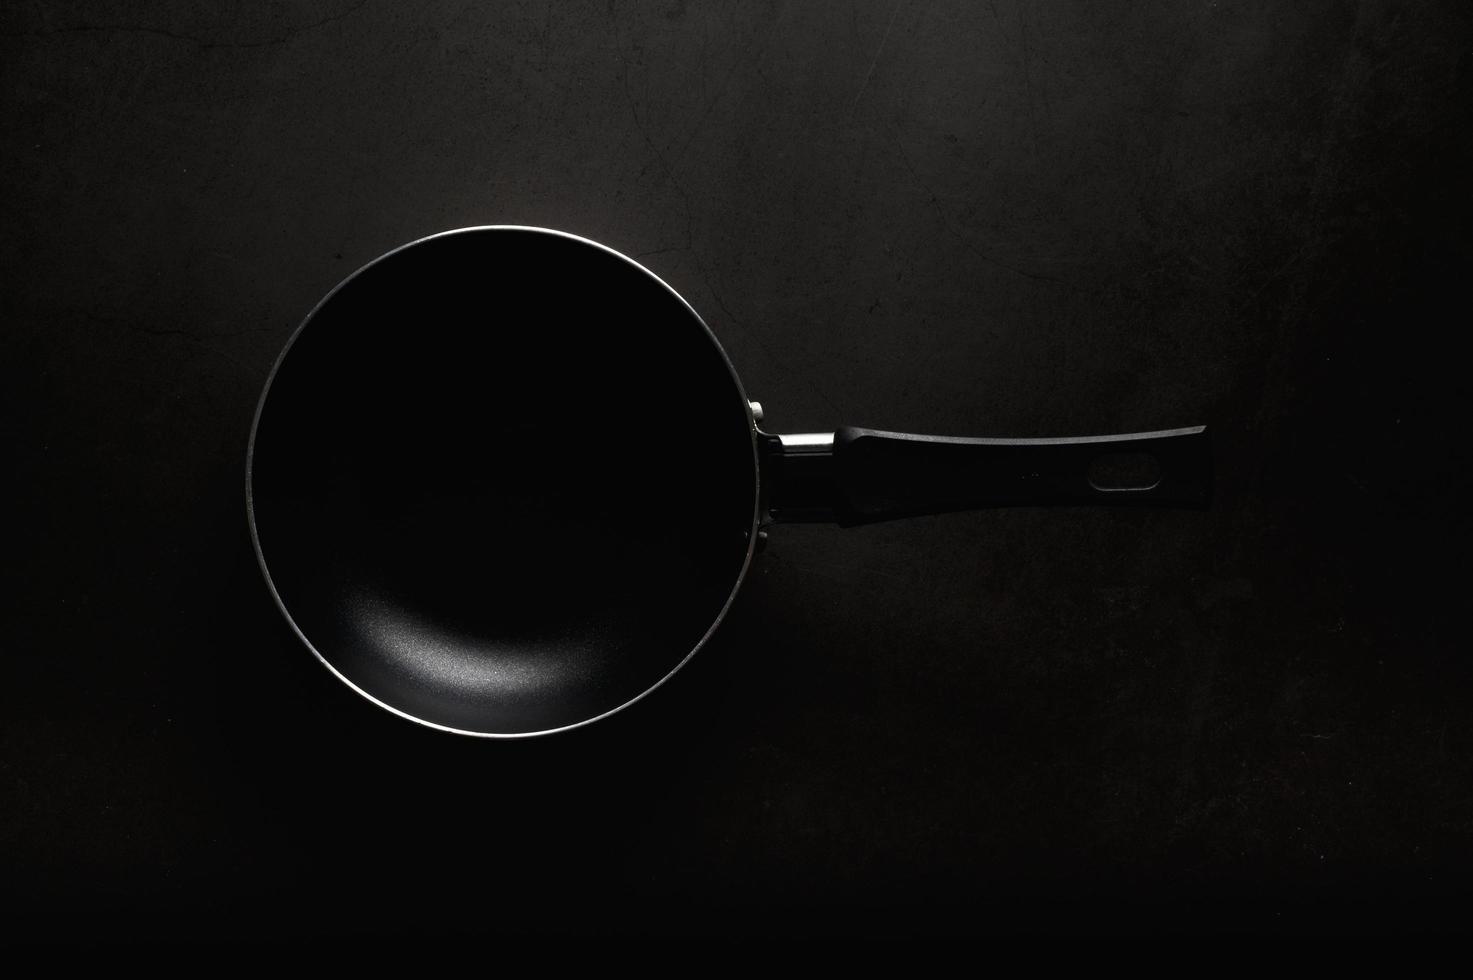 Black frying pan top view photo